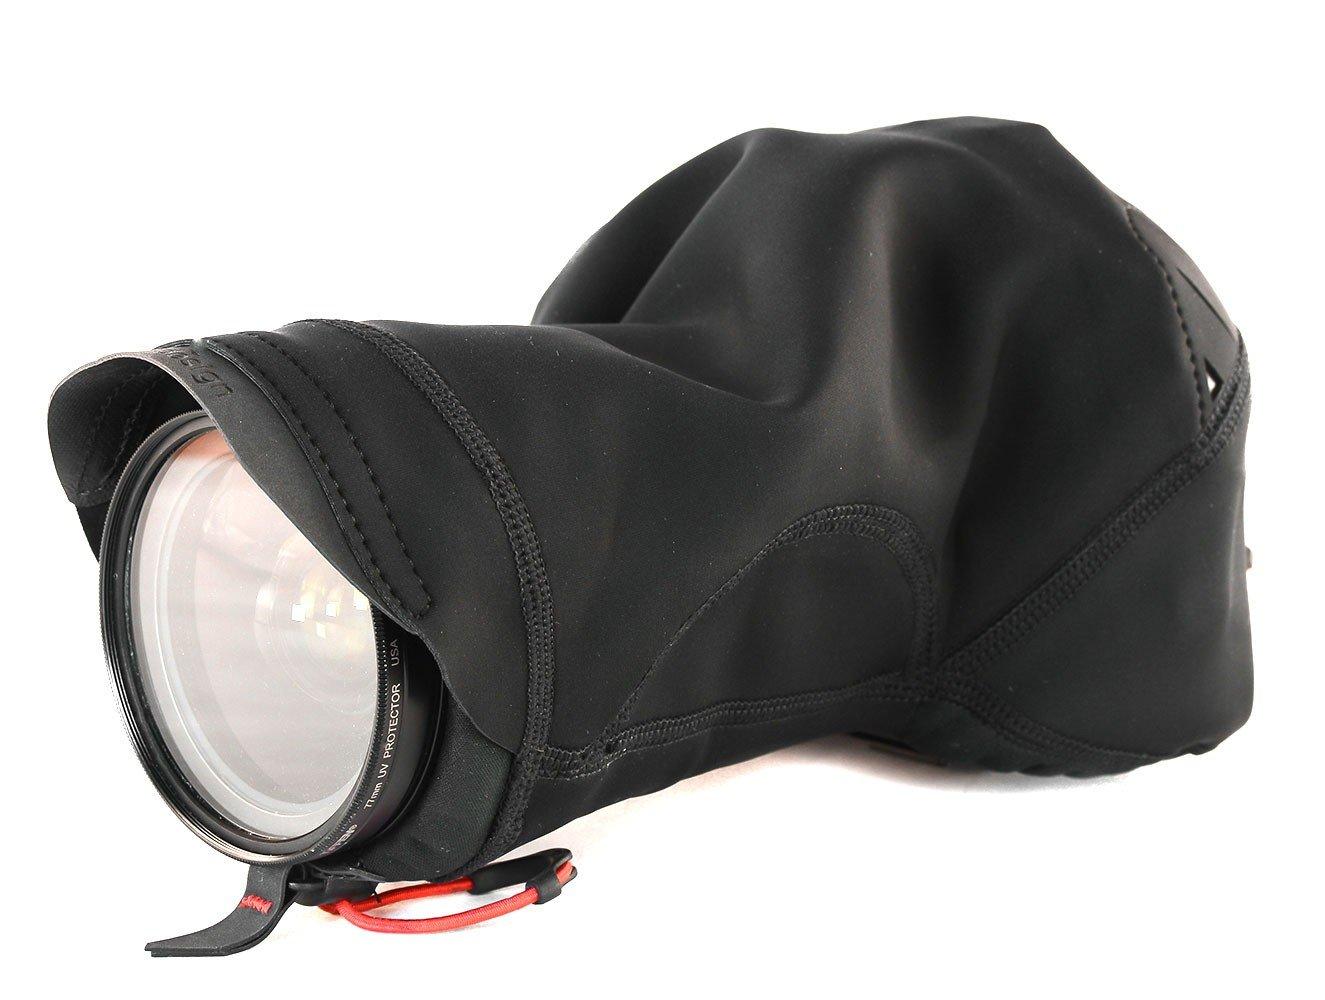 Peak Design Black Shell Medium Form-Fitting Rain and Dust Cover by Peak Design